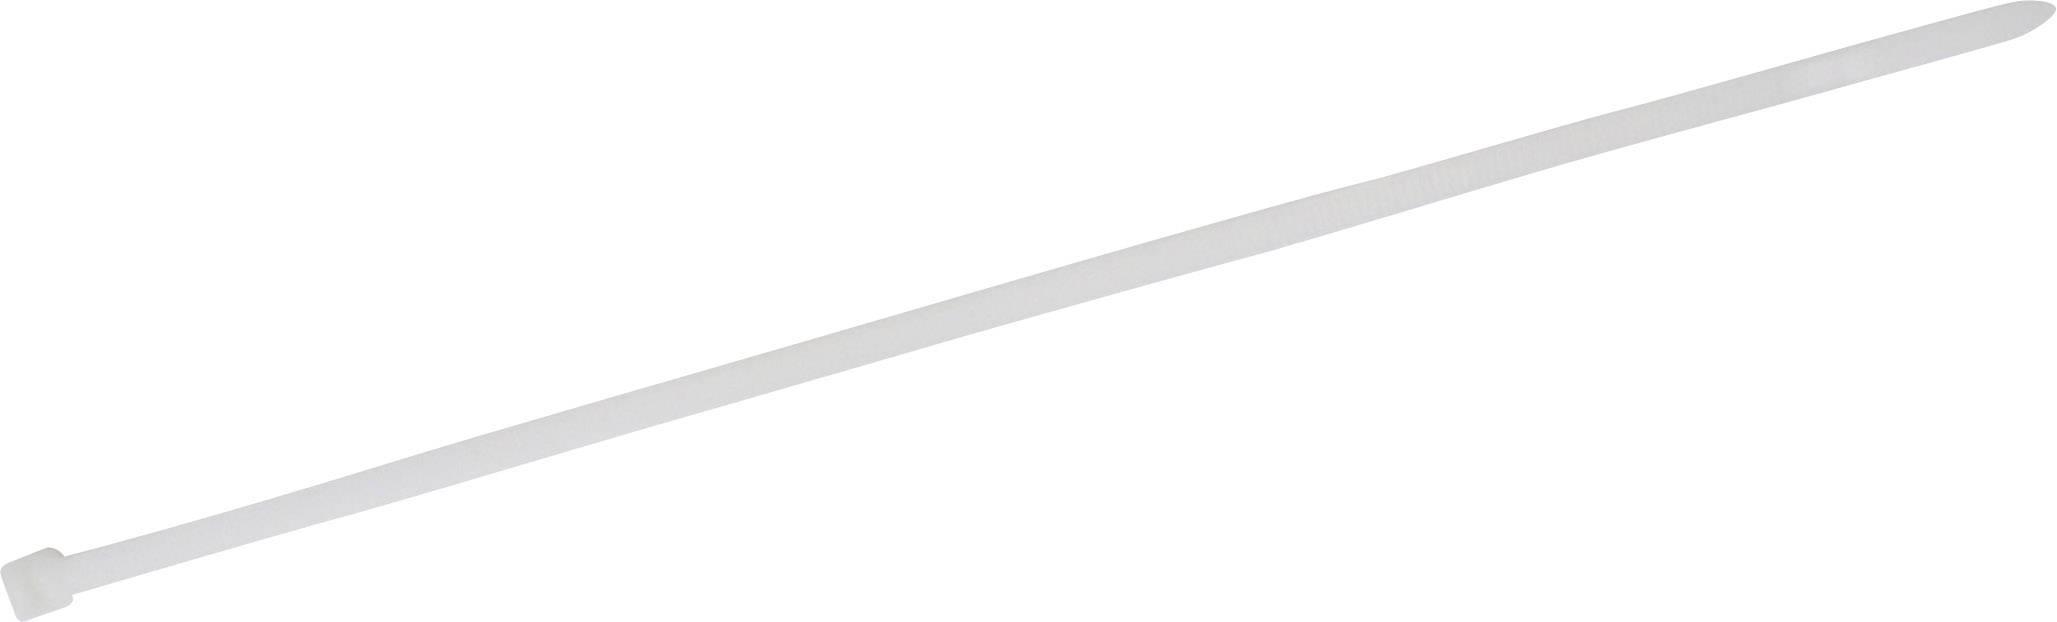 Stahovací pásky TRU COMPONENTS 1578063, 300 mm, bílá, 100 ks